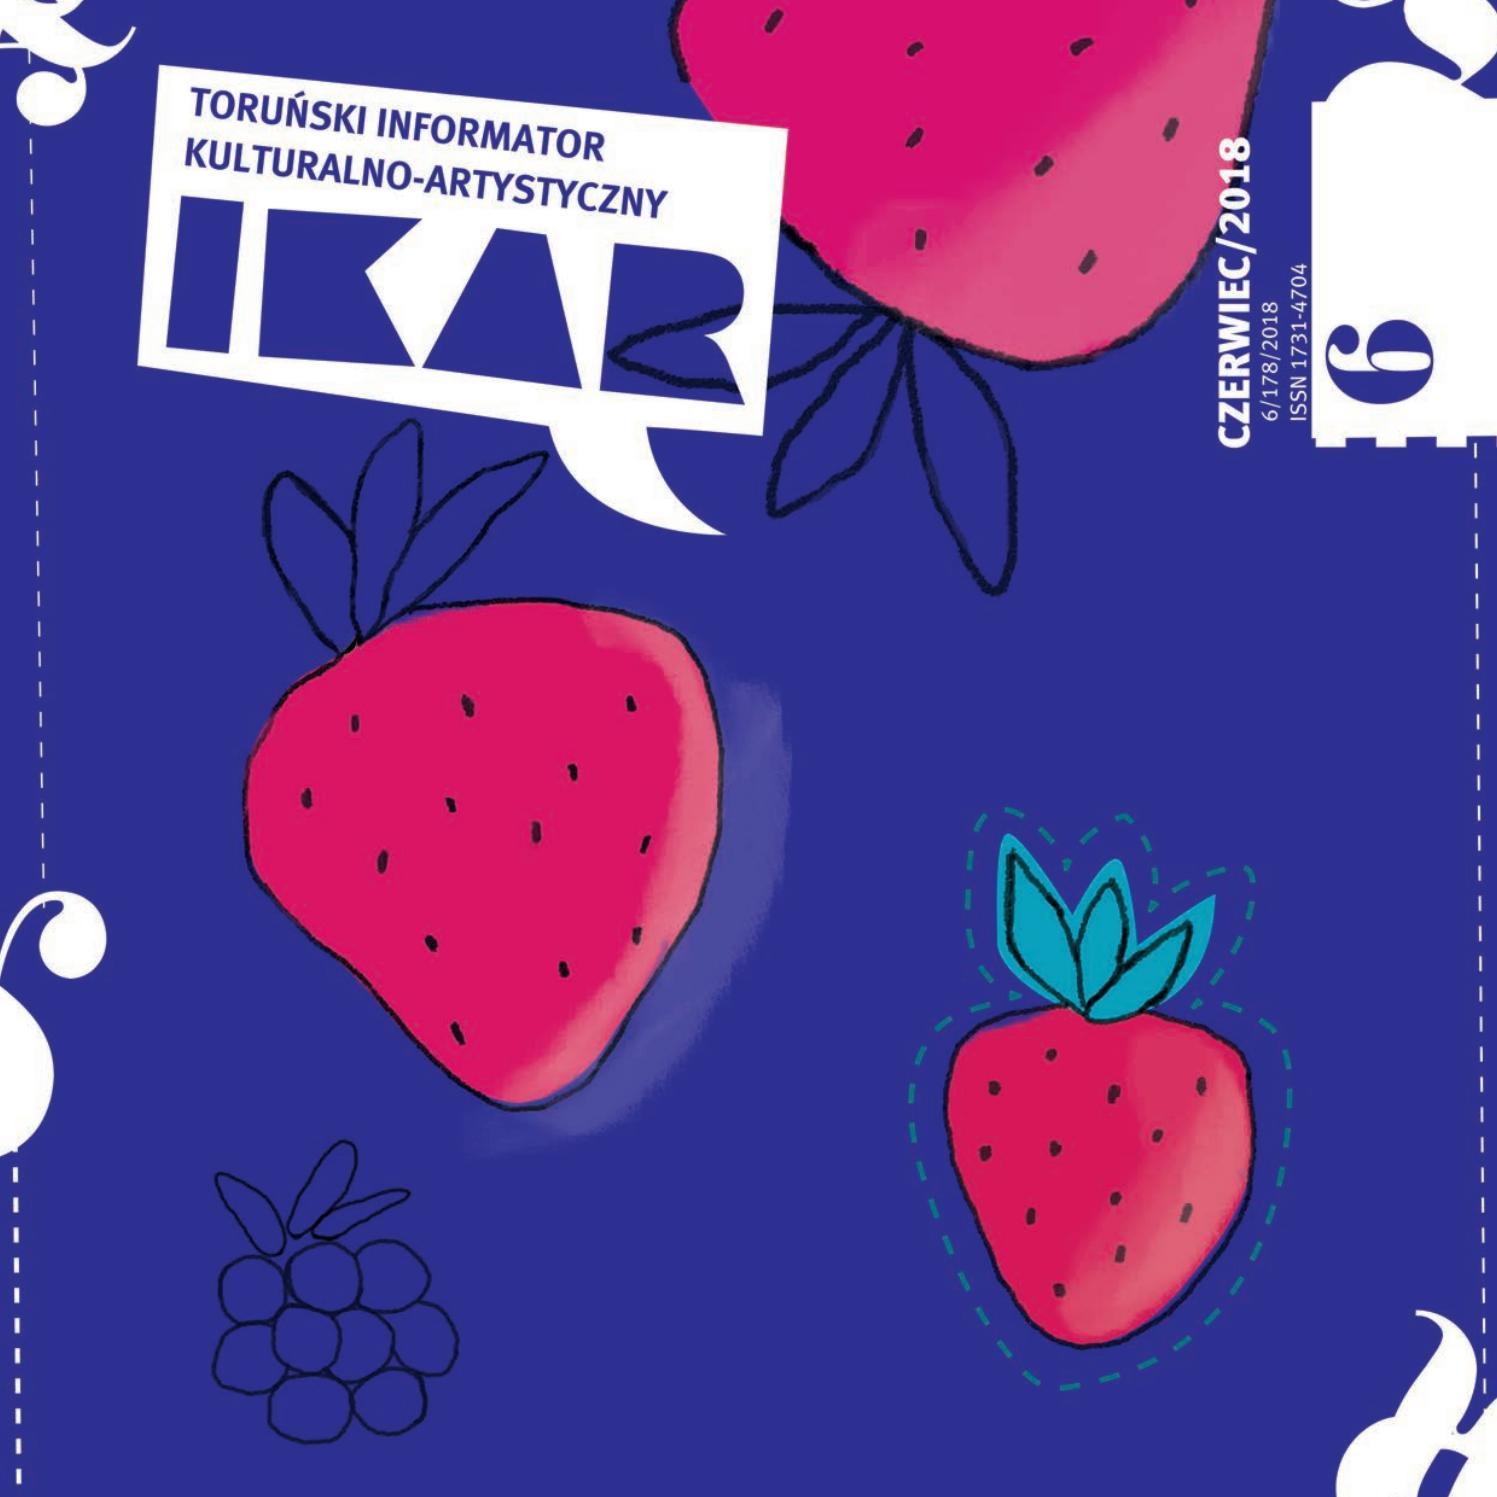 Ikar 61782018 By Toruński Informator Kulturalno